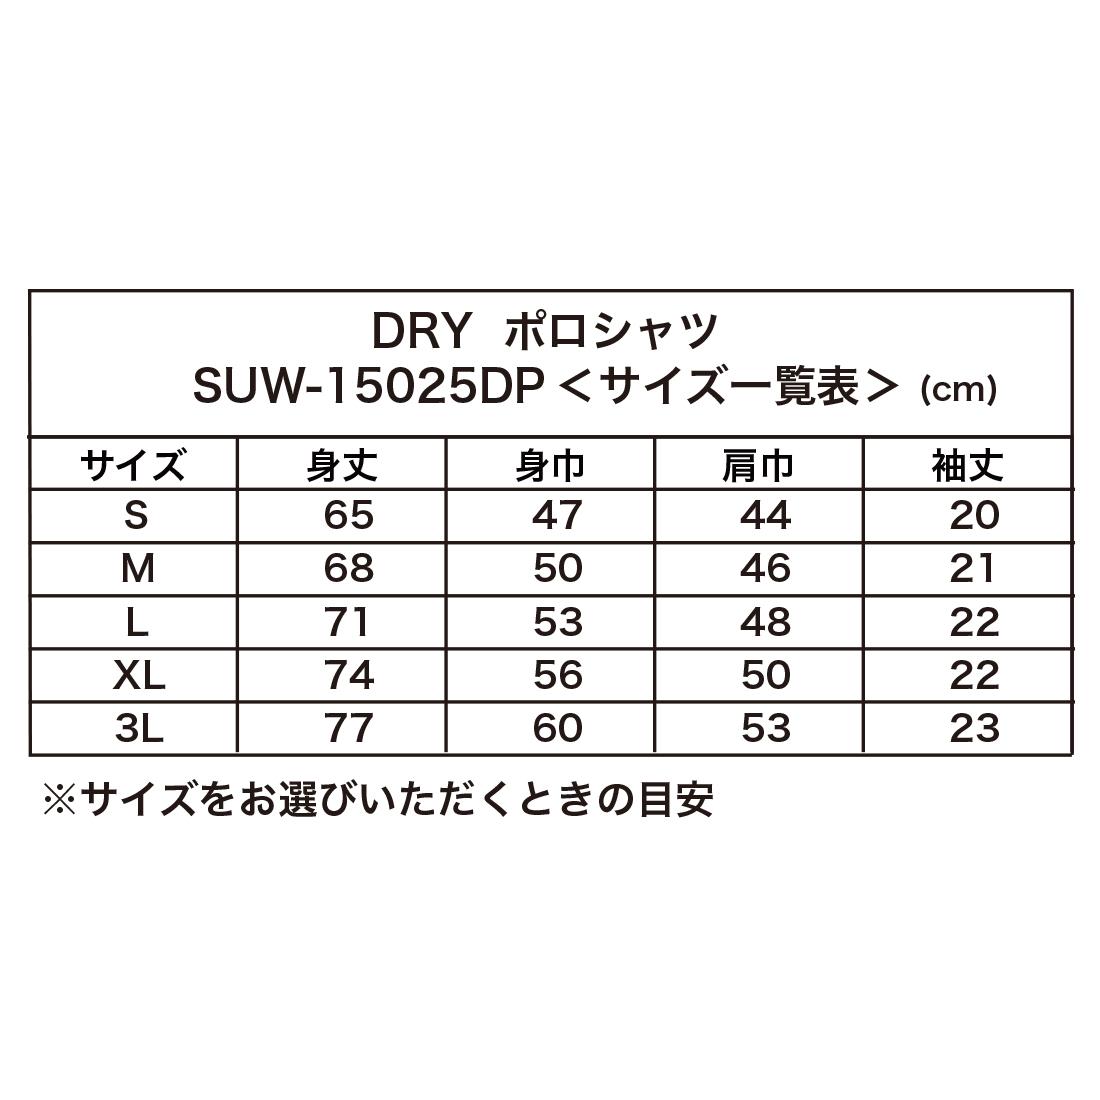 DRY ポロシャツ SUW−15025DP